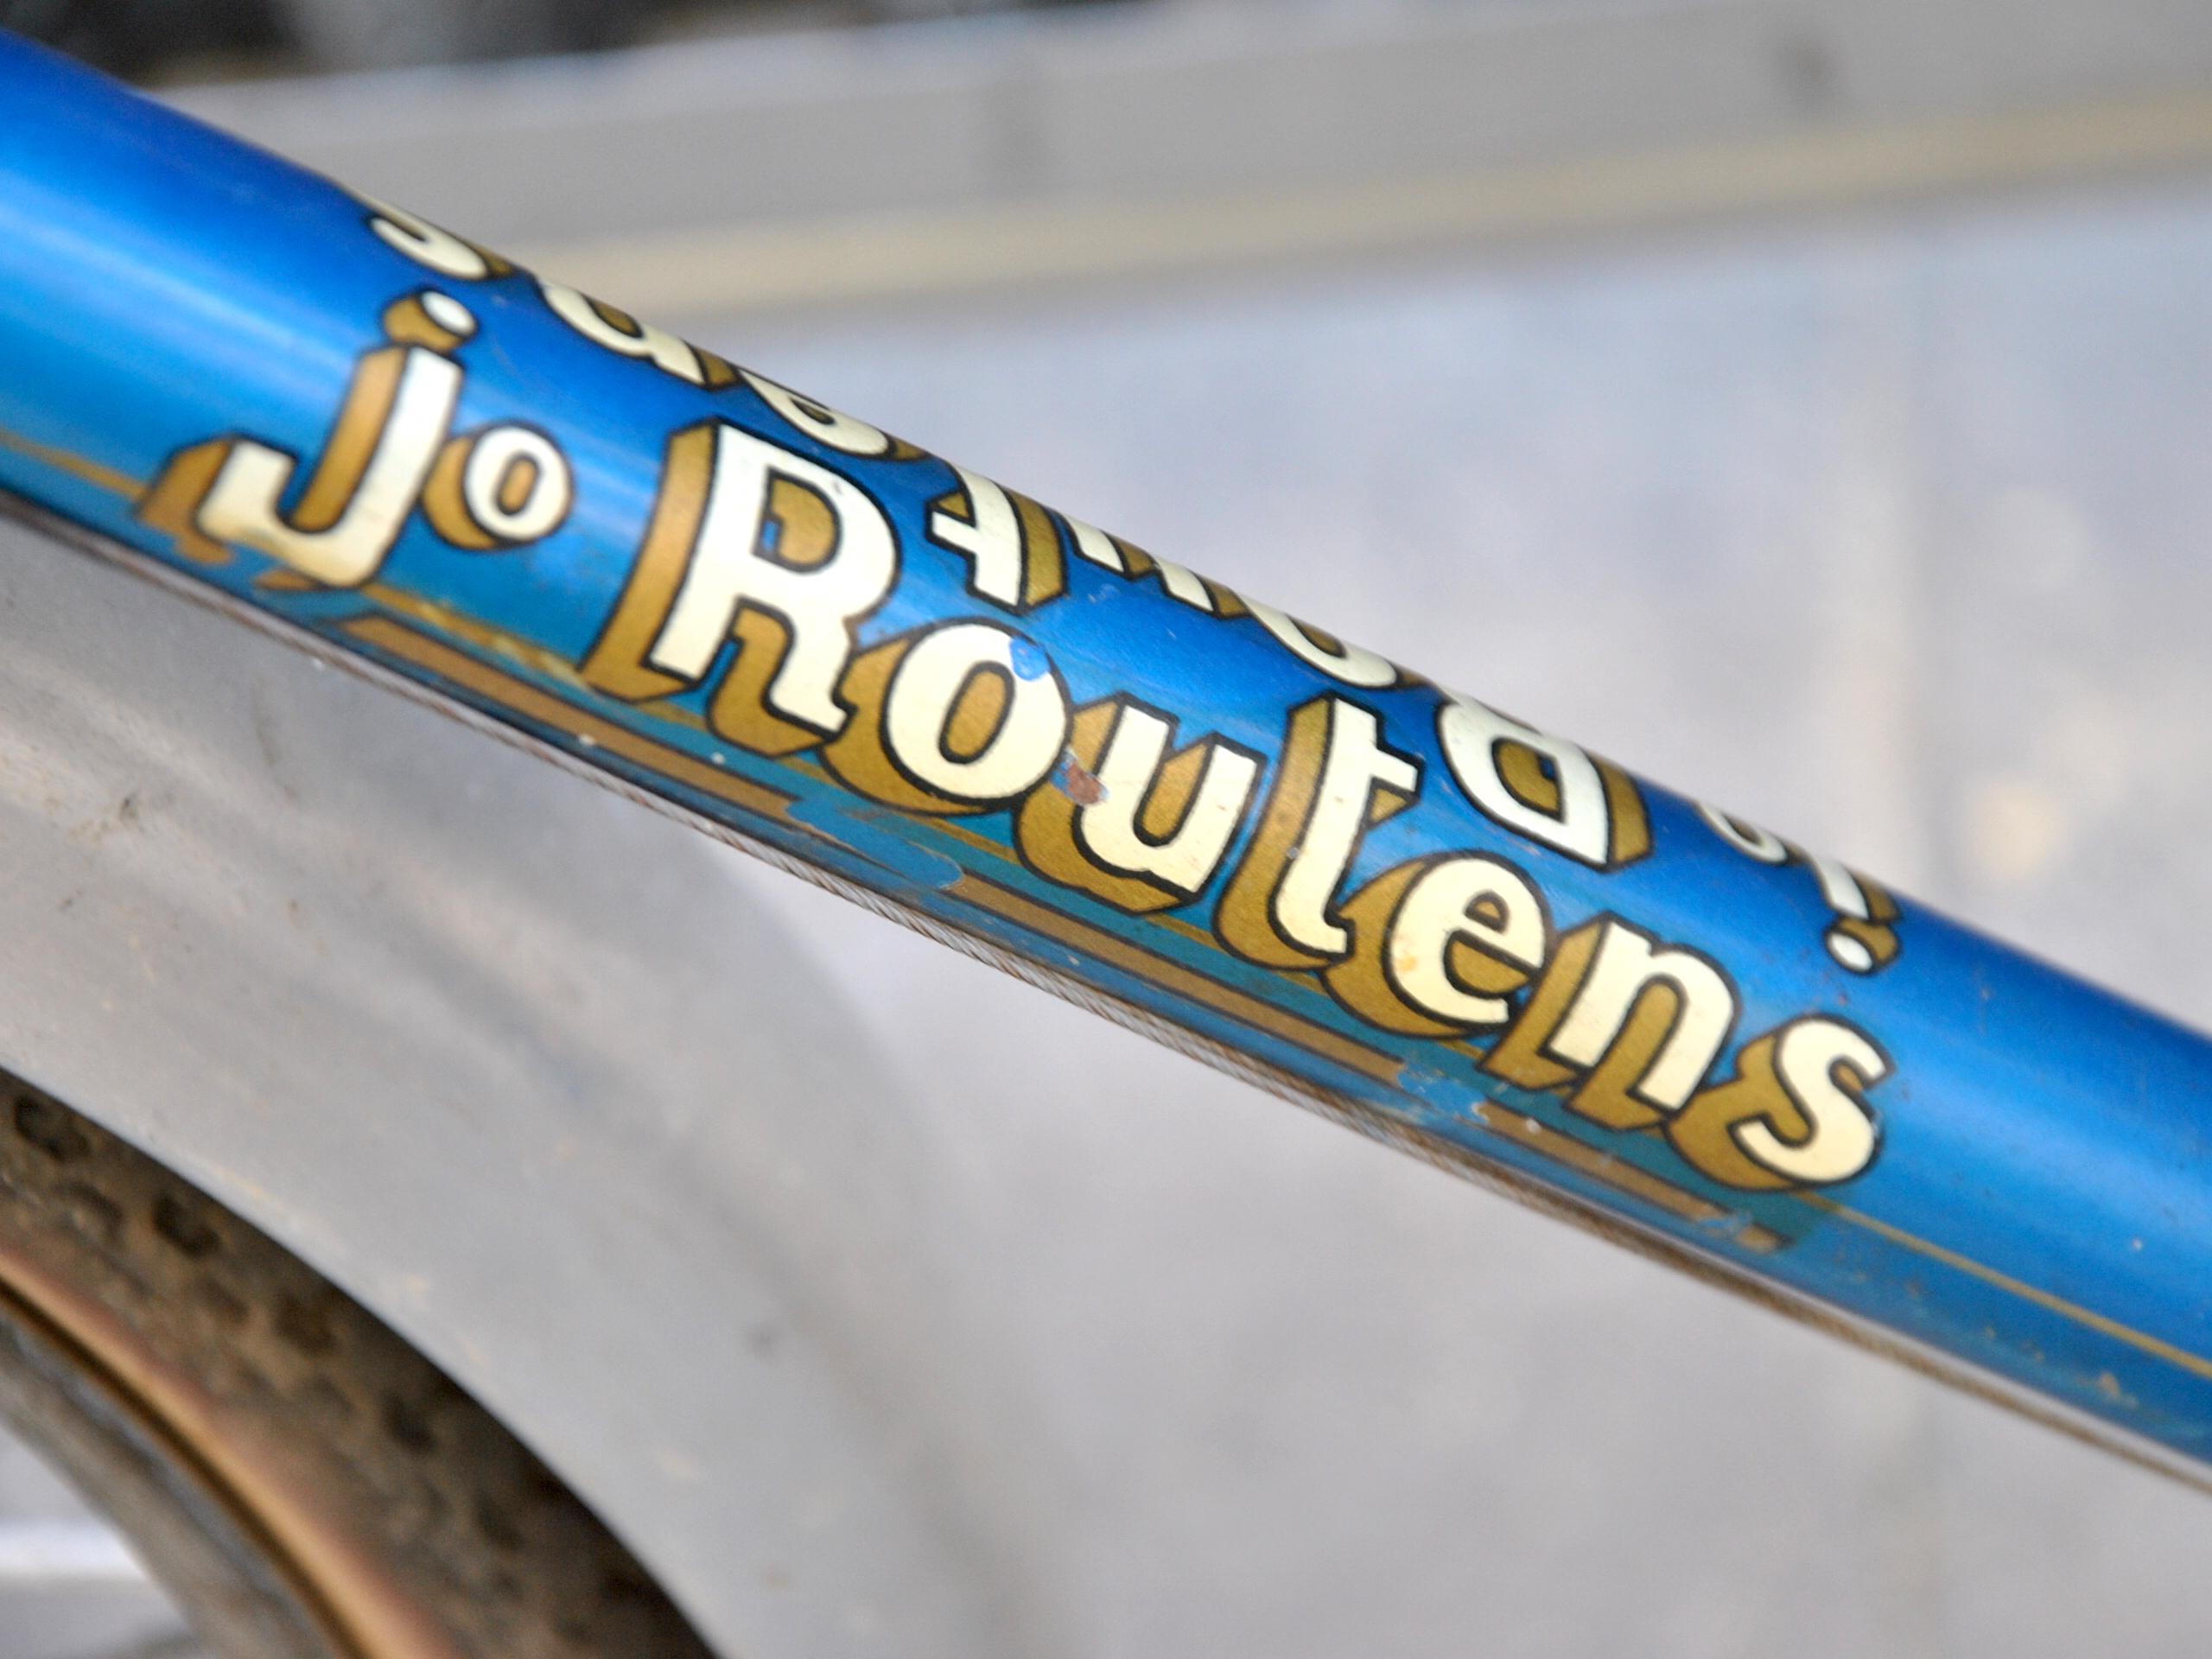 randonneuse Jo Routens